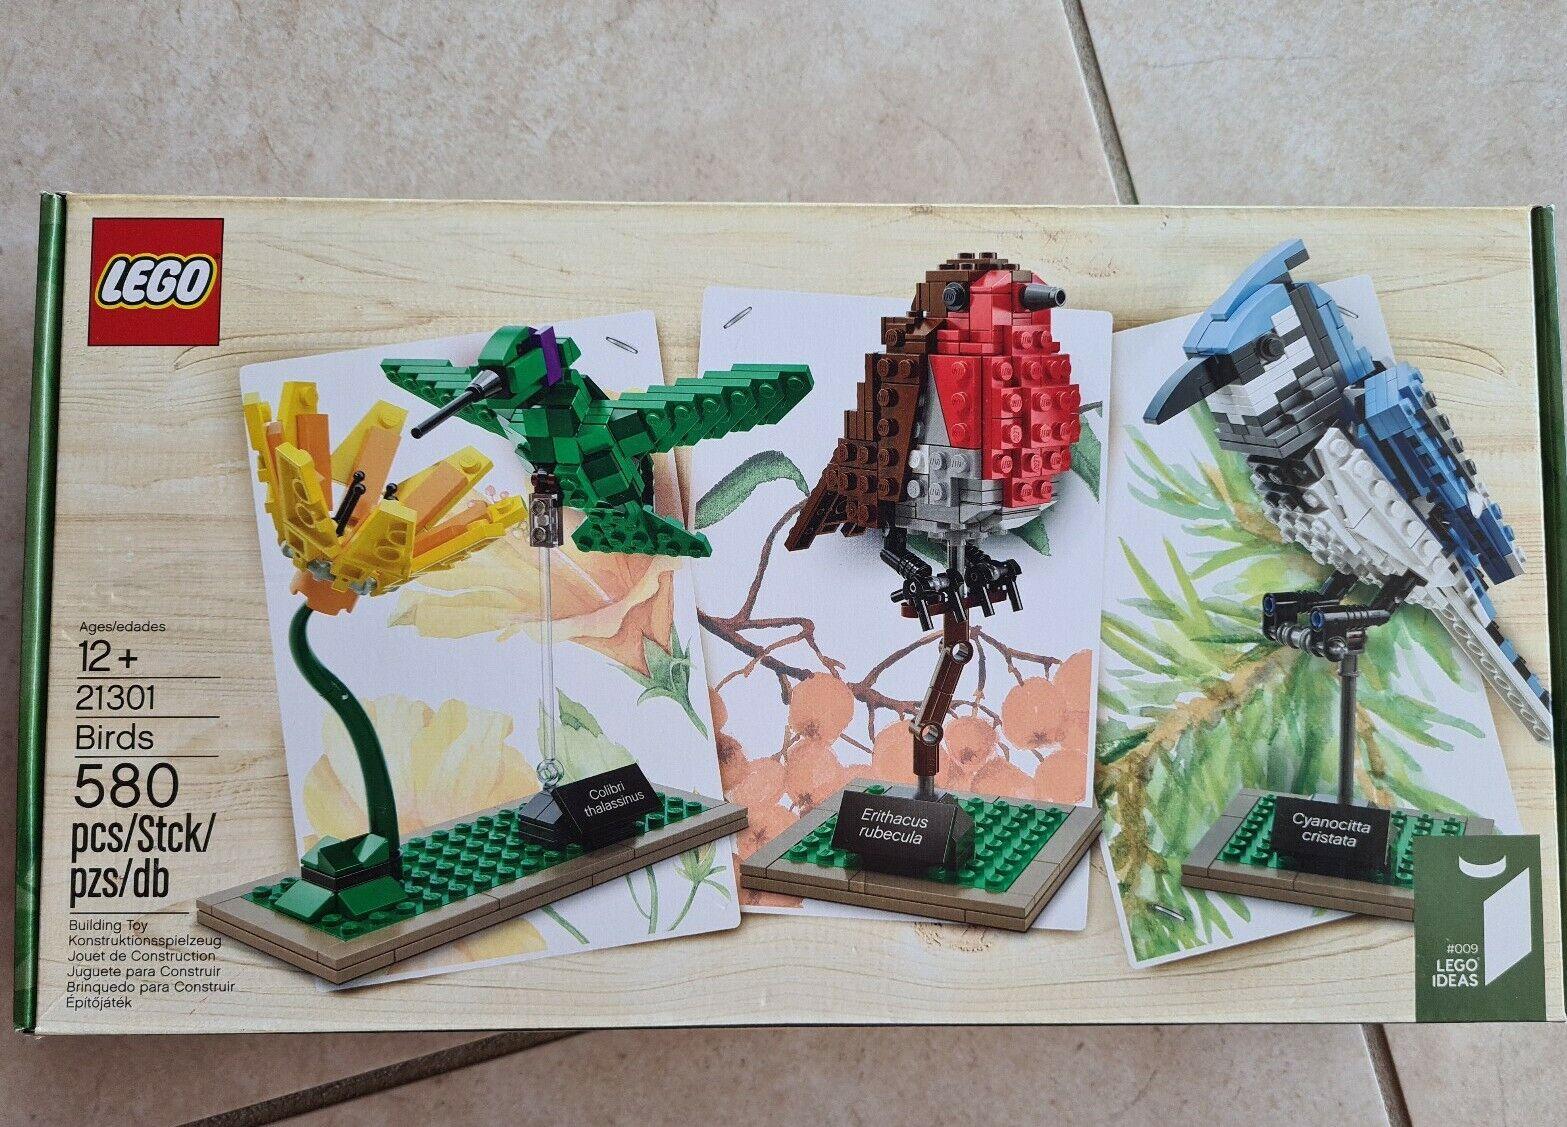 Brand New In Sealed Box Lego Ideas Set 21301 Birds Building Model Kit